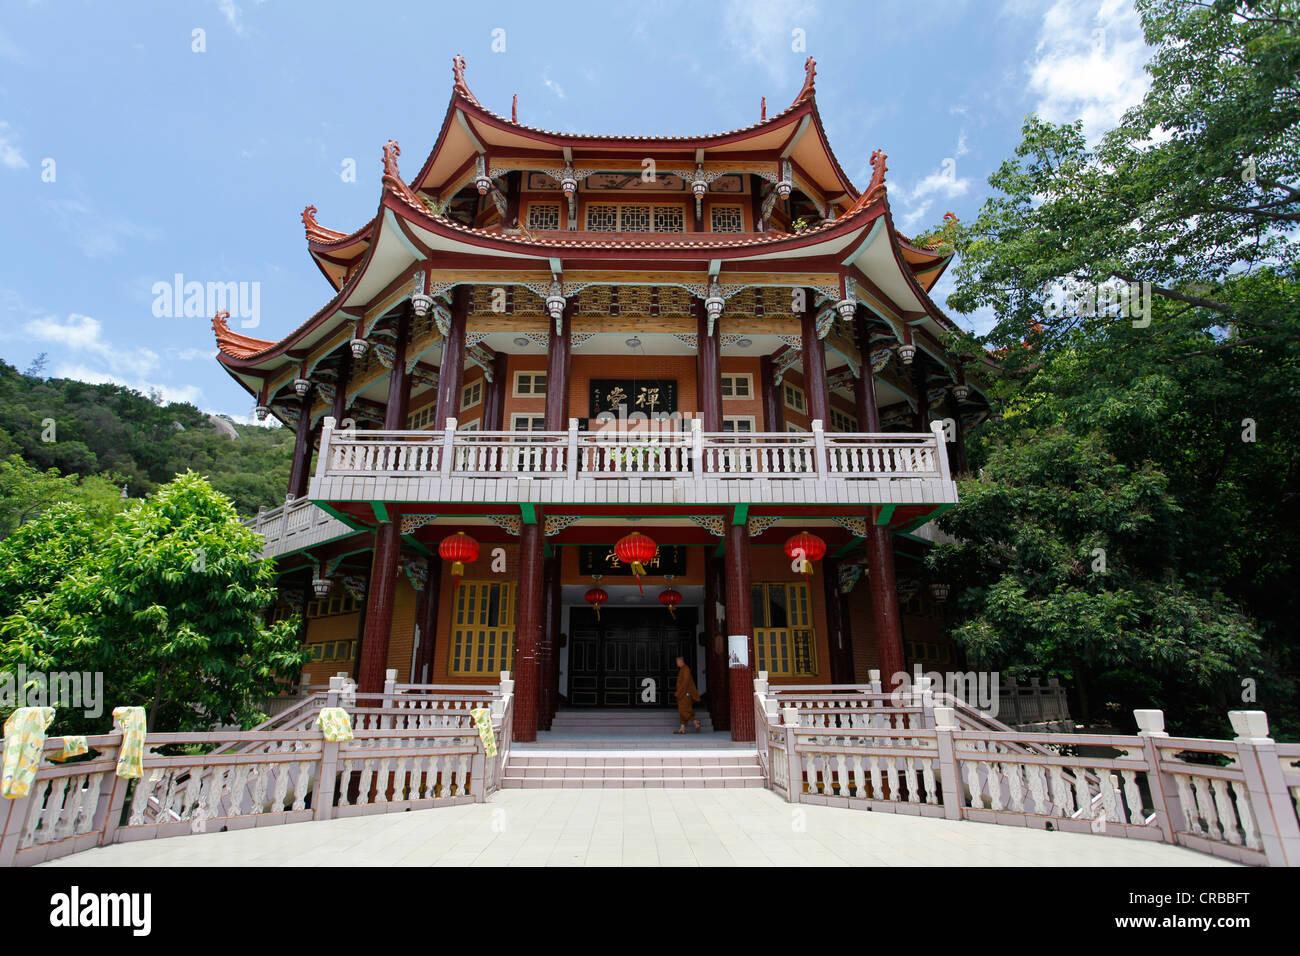 Nanputuo temple, Xiamen, also known as Amoy, Fujian province, China, Asia - Stock Image